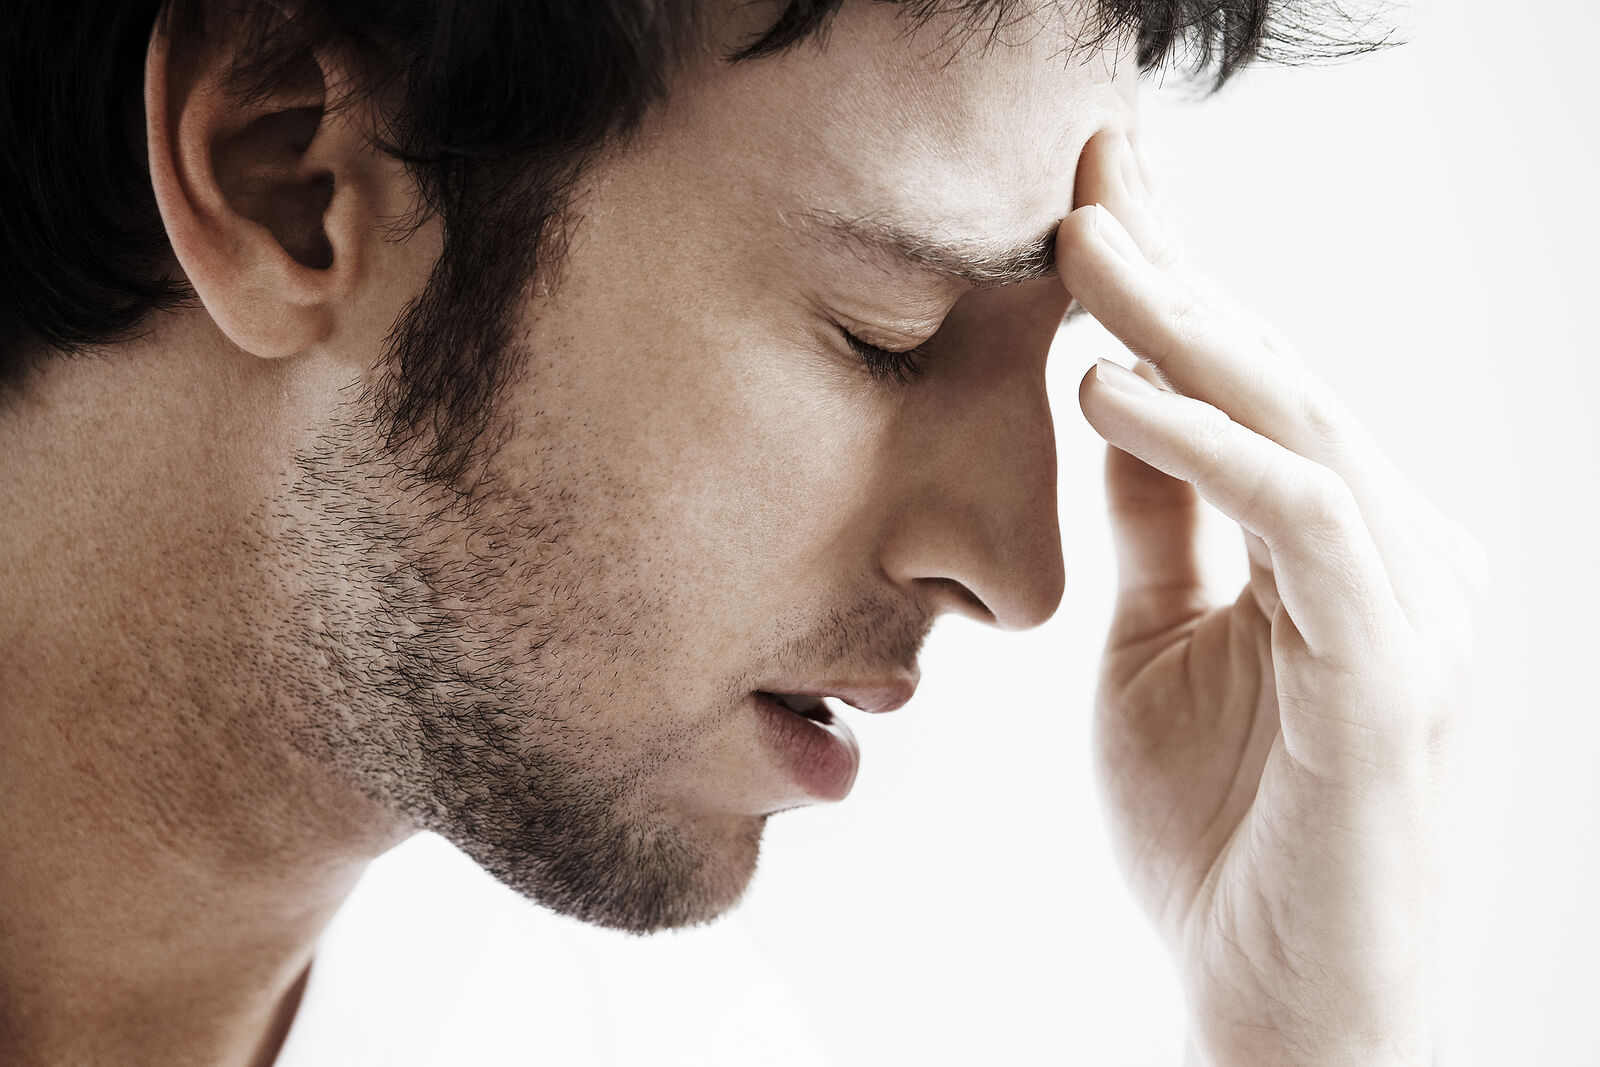 Causes of Migraines in Men